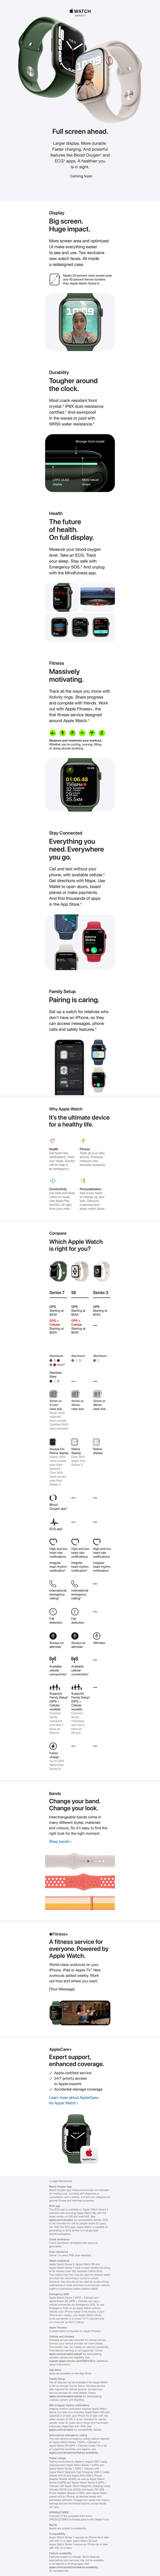 Apple Watch Series 7 River - Coming Soon